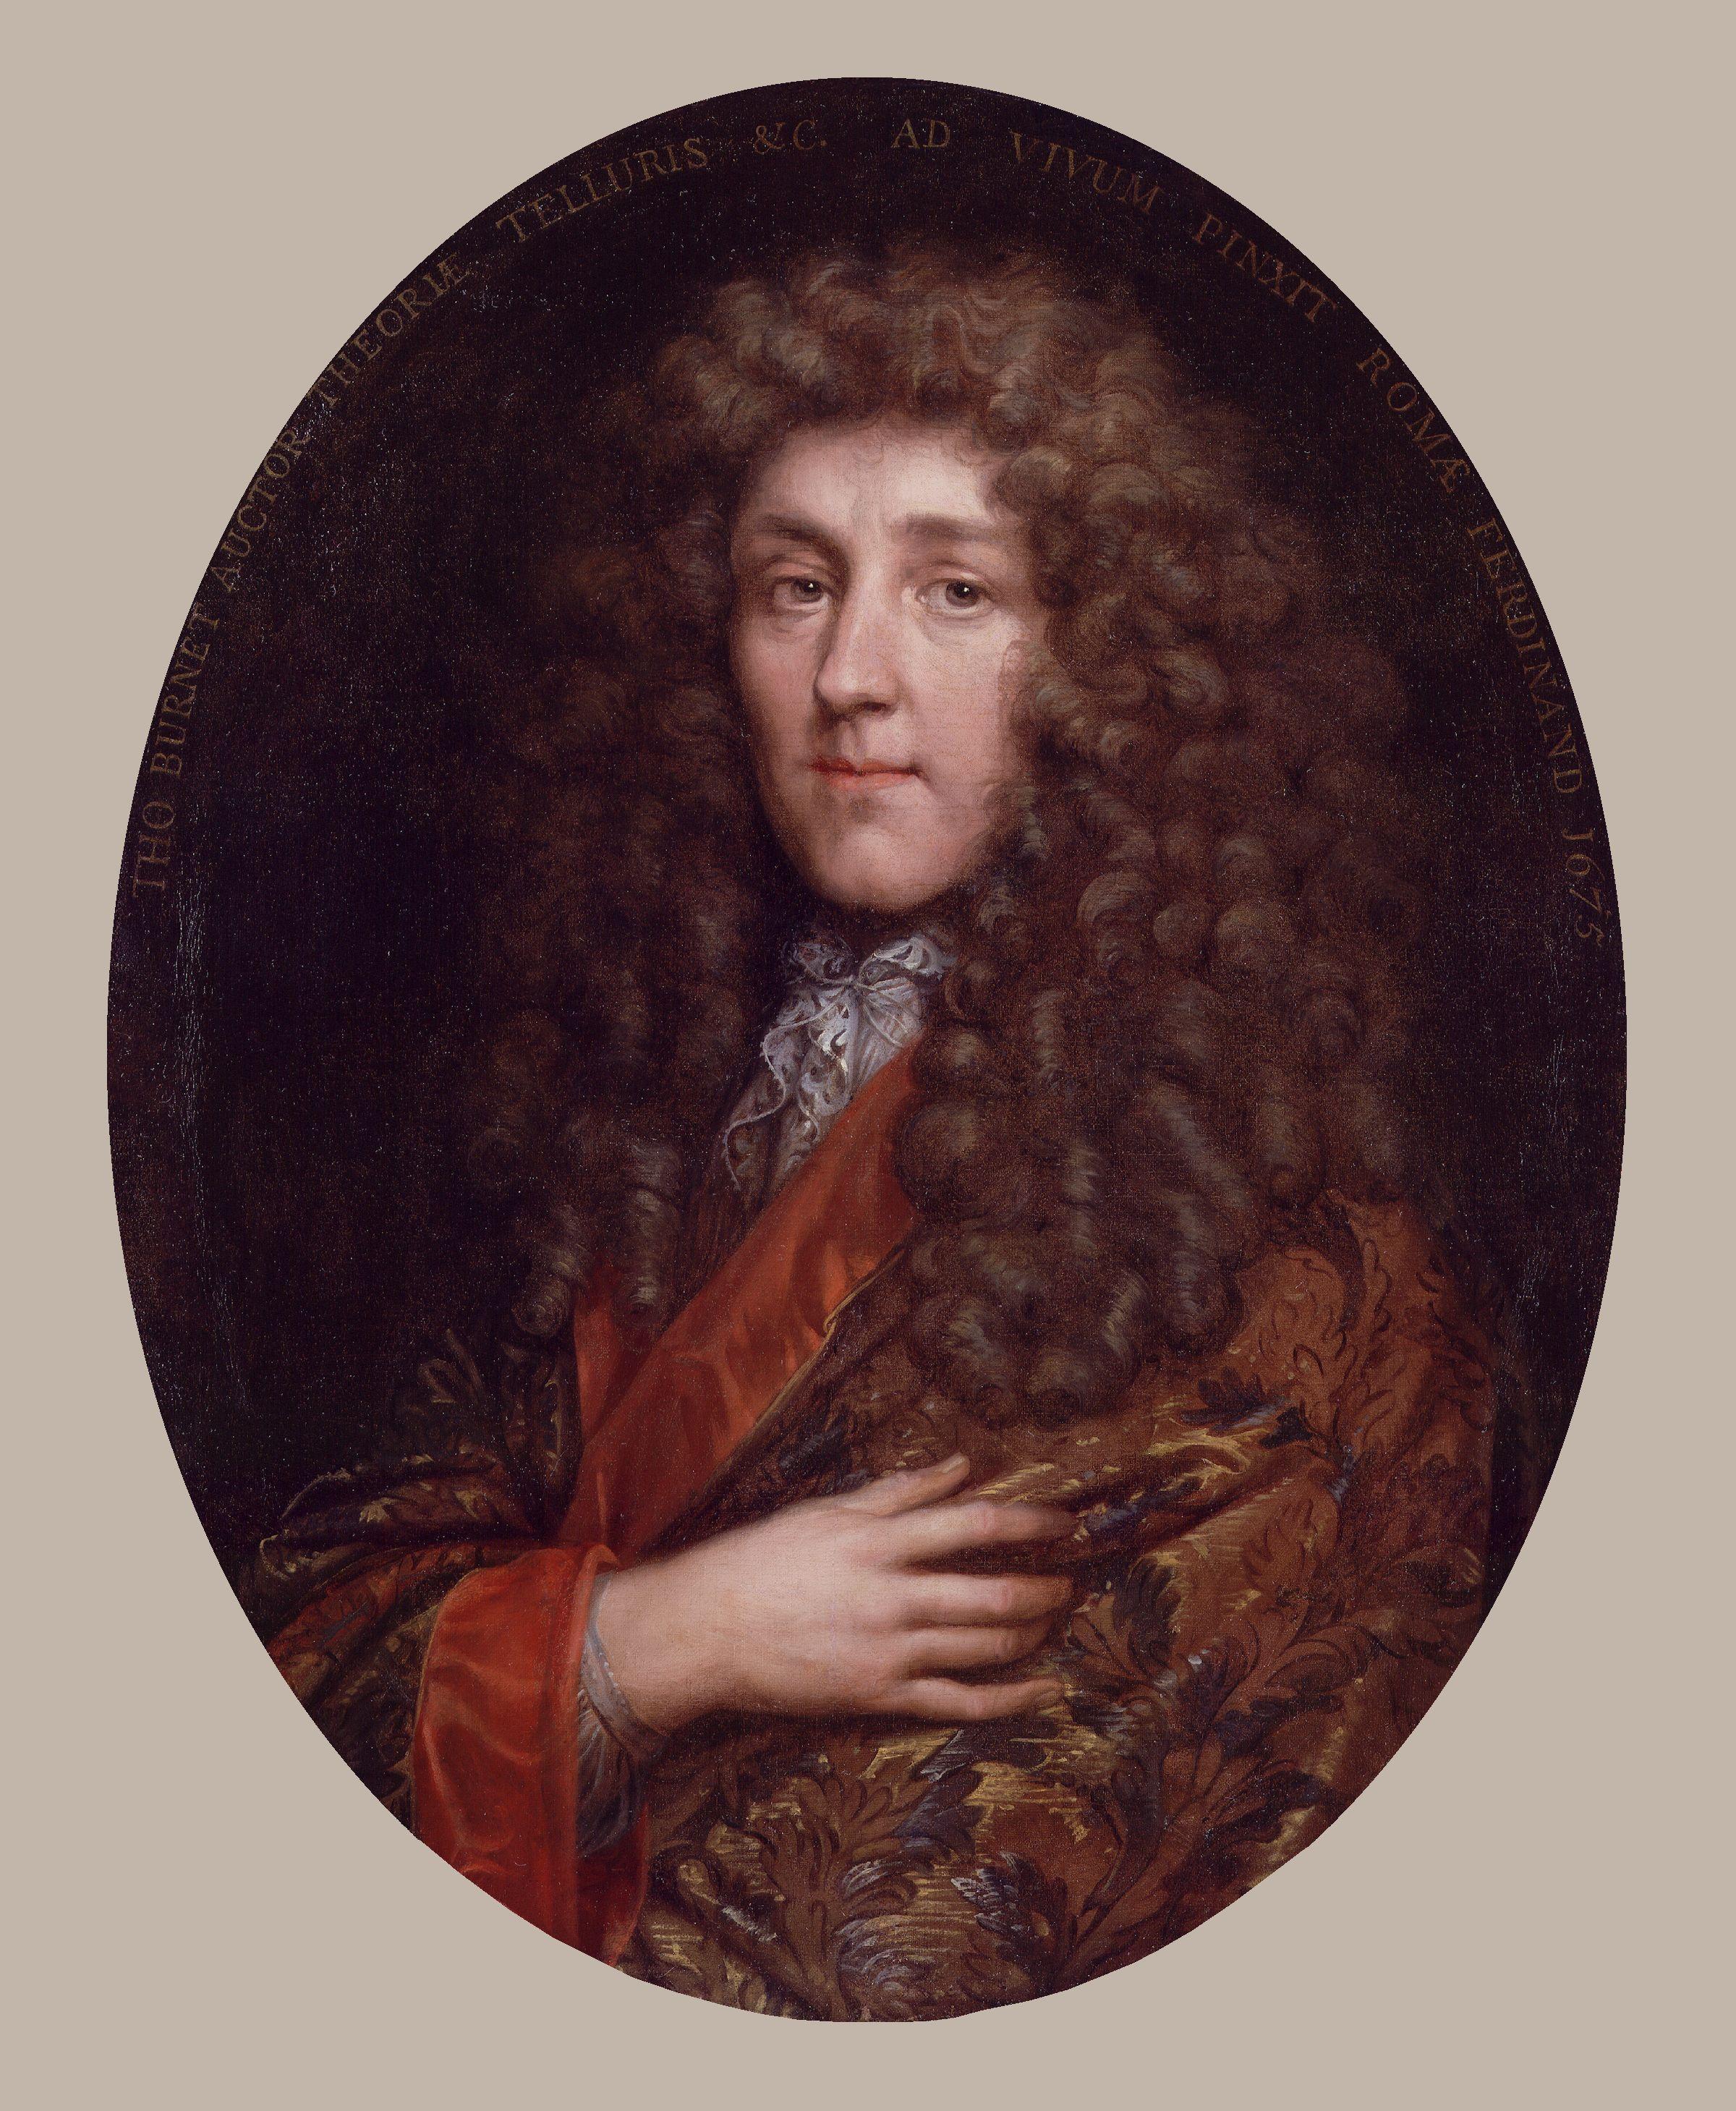 https://upload.wikimedia.org/wikipedia/commons/2/2b/Thomas_Burnet_by_Jacob_Ferdinand_Voet.jpg